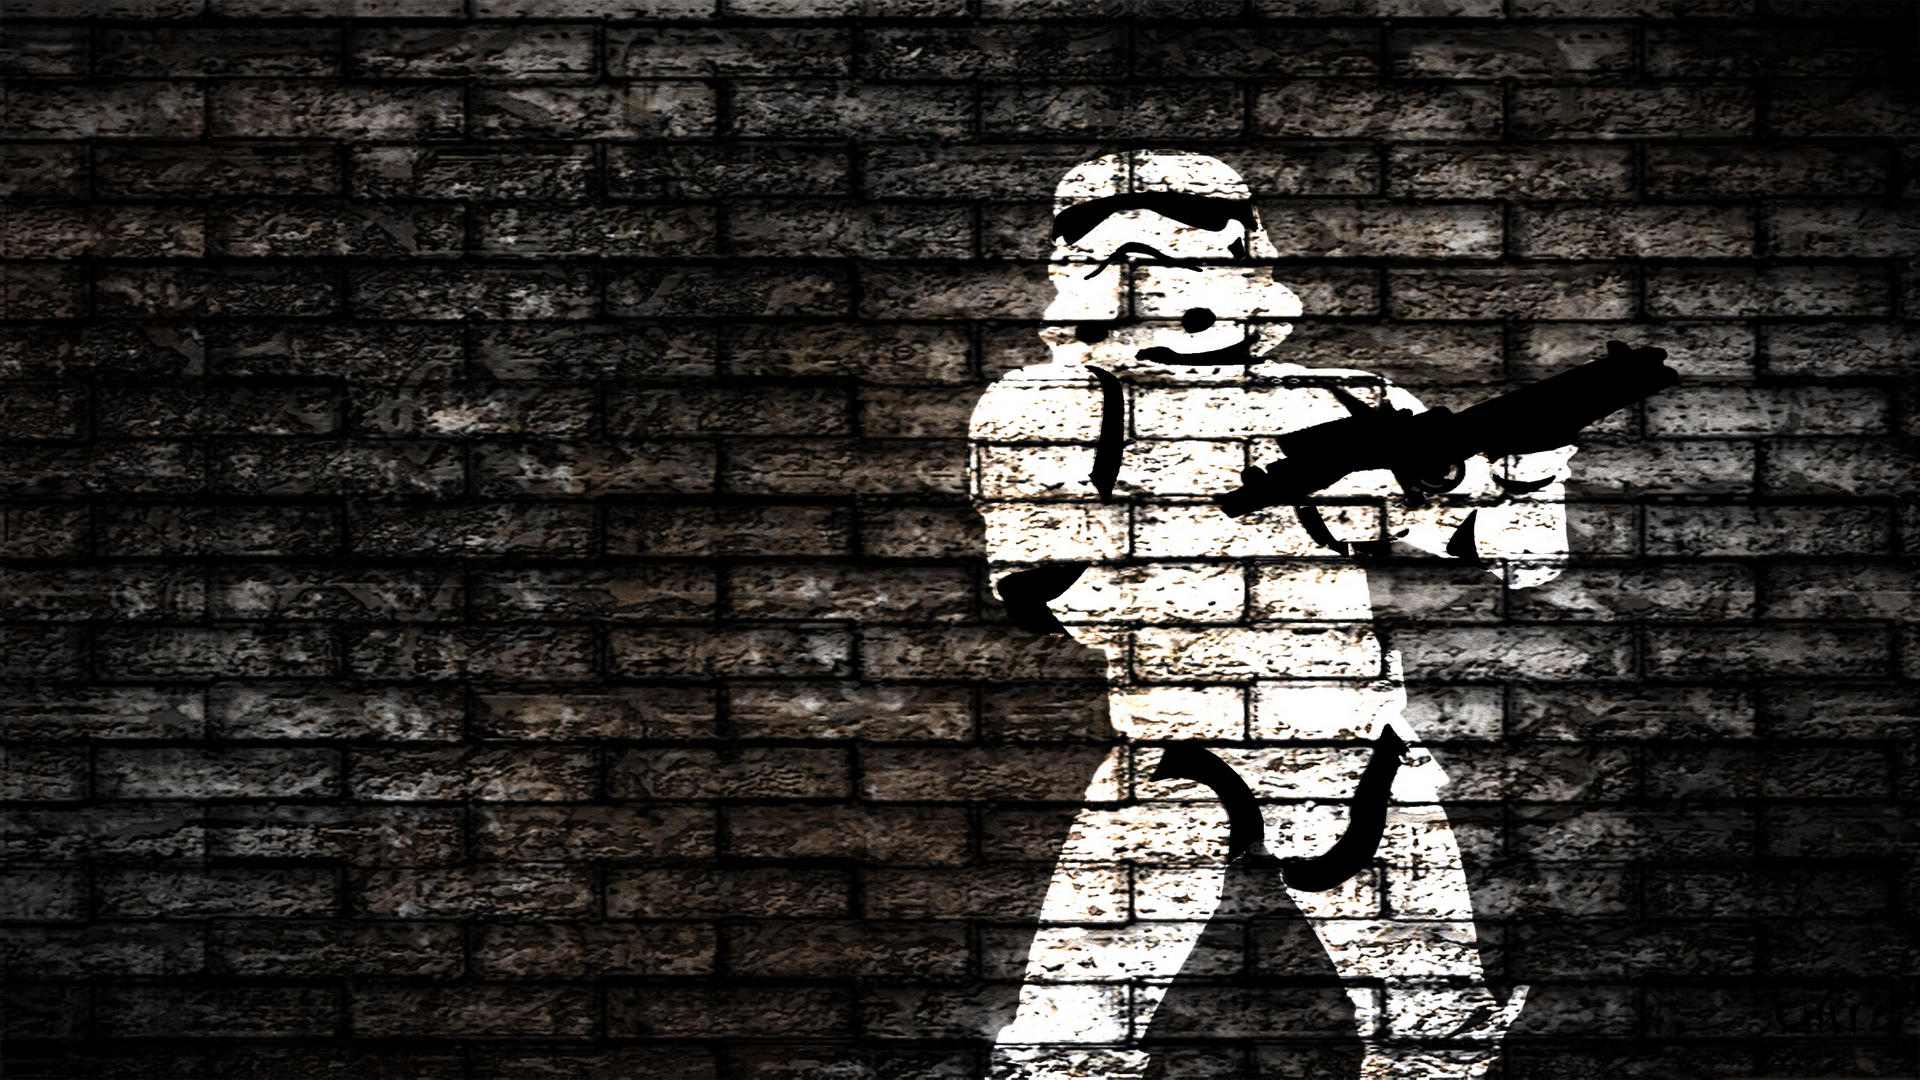 Star Wars Wallpapers Stormtrooper Wallpaper star wars 26662735 2560 1920x1080